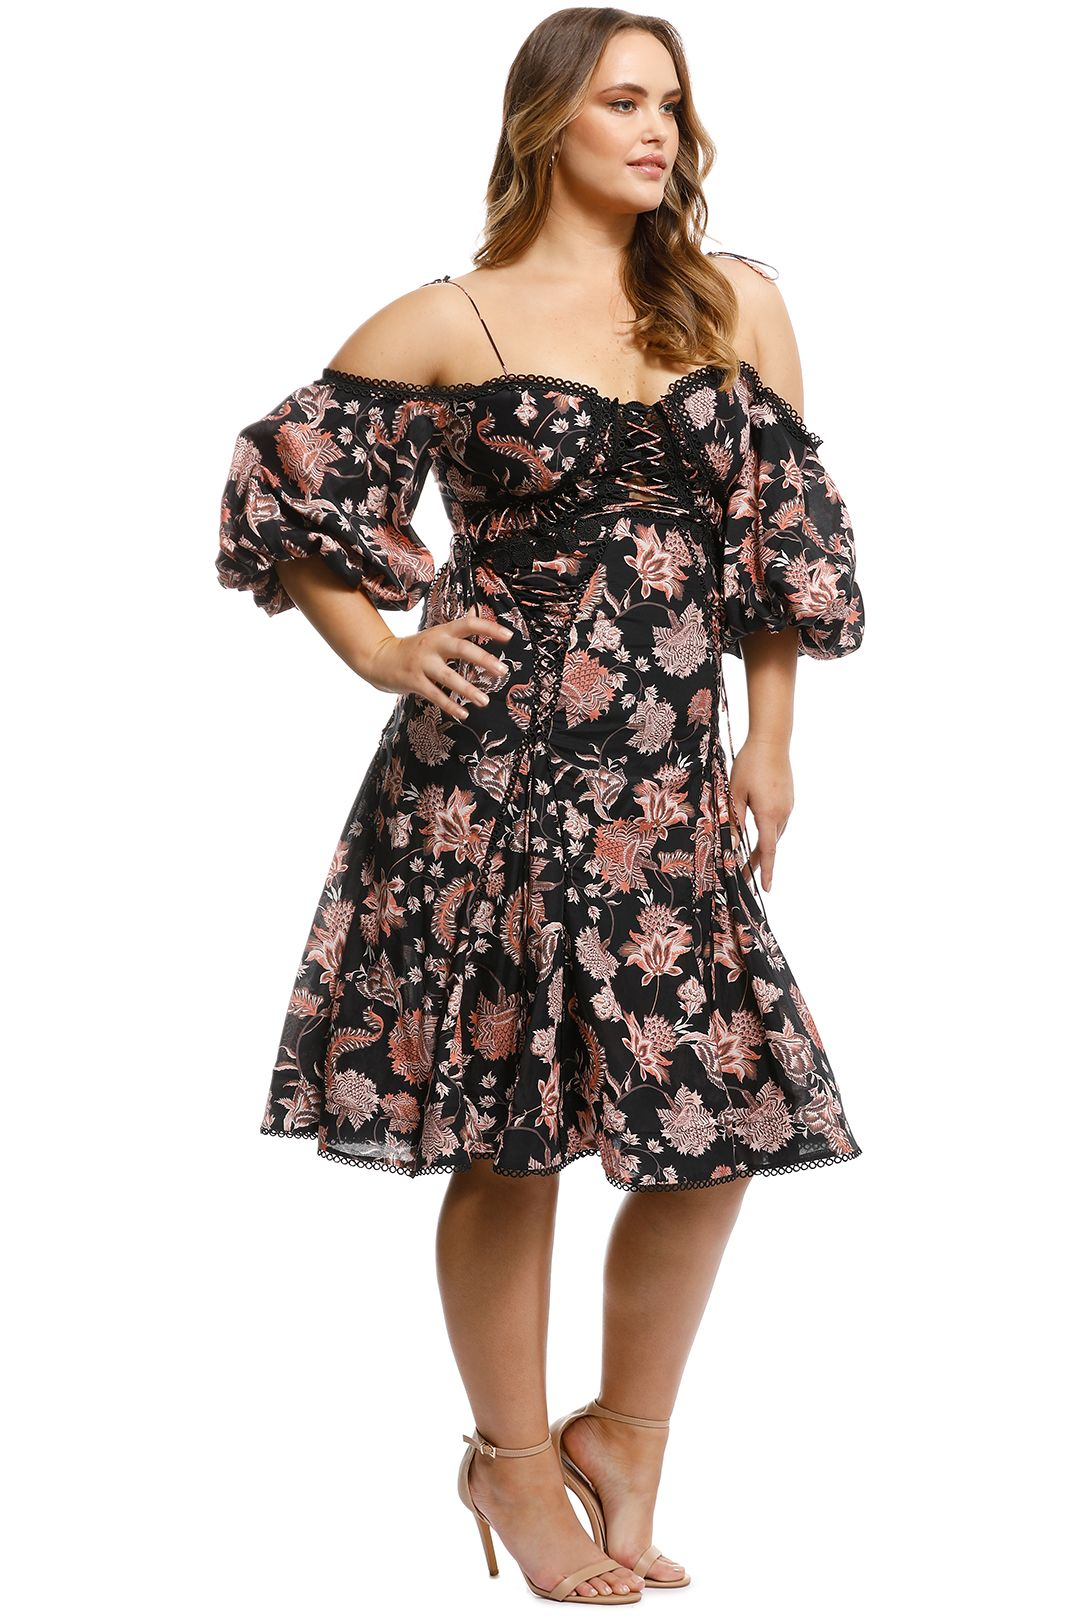 Thurley - Pineapple Chintz Lace Up Midi Dress - Print - Side